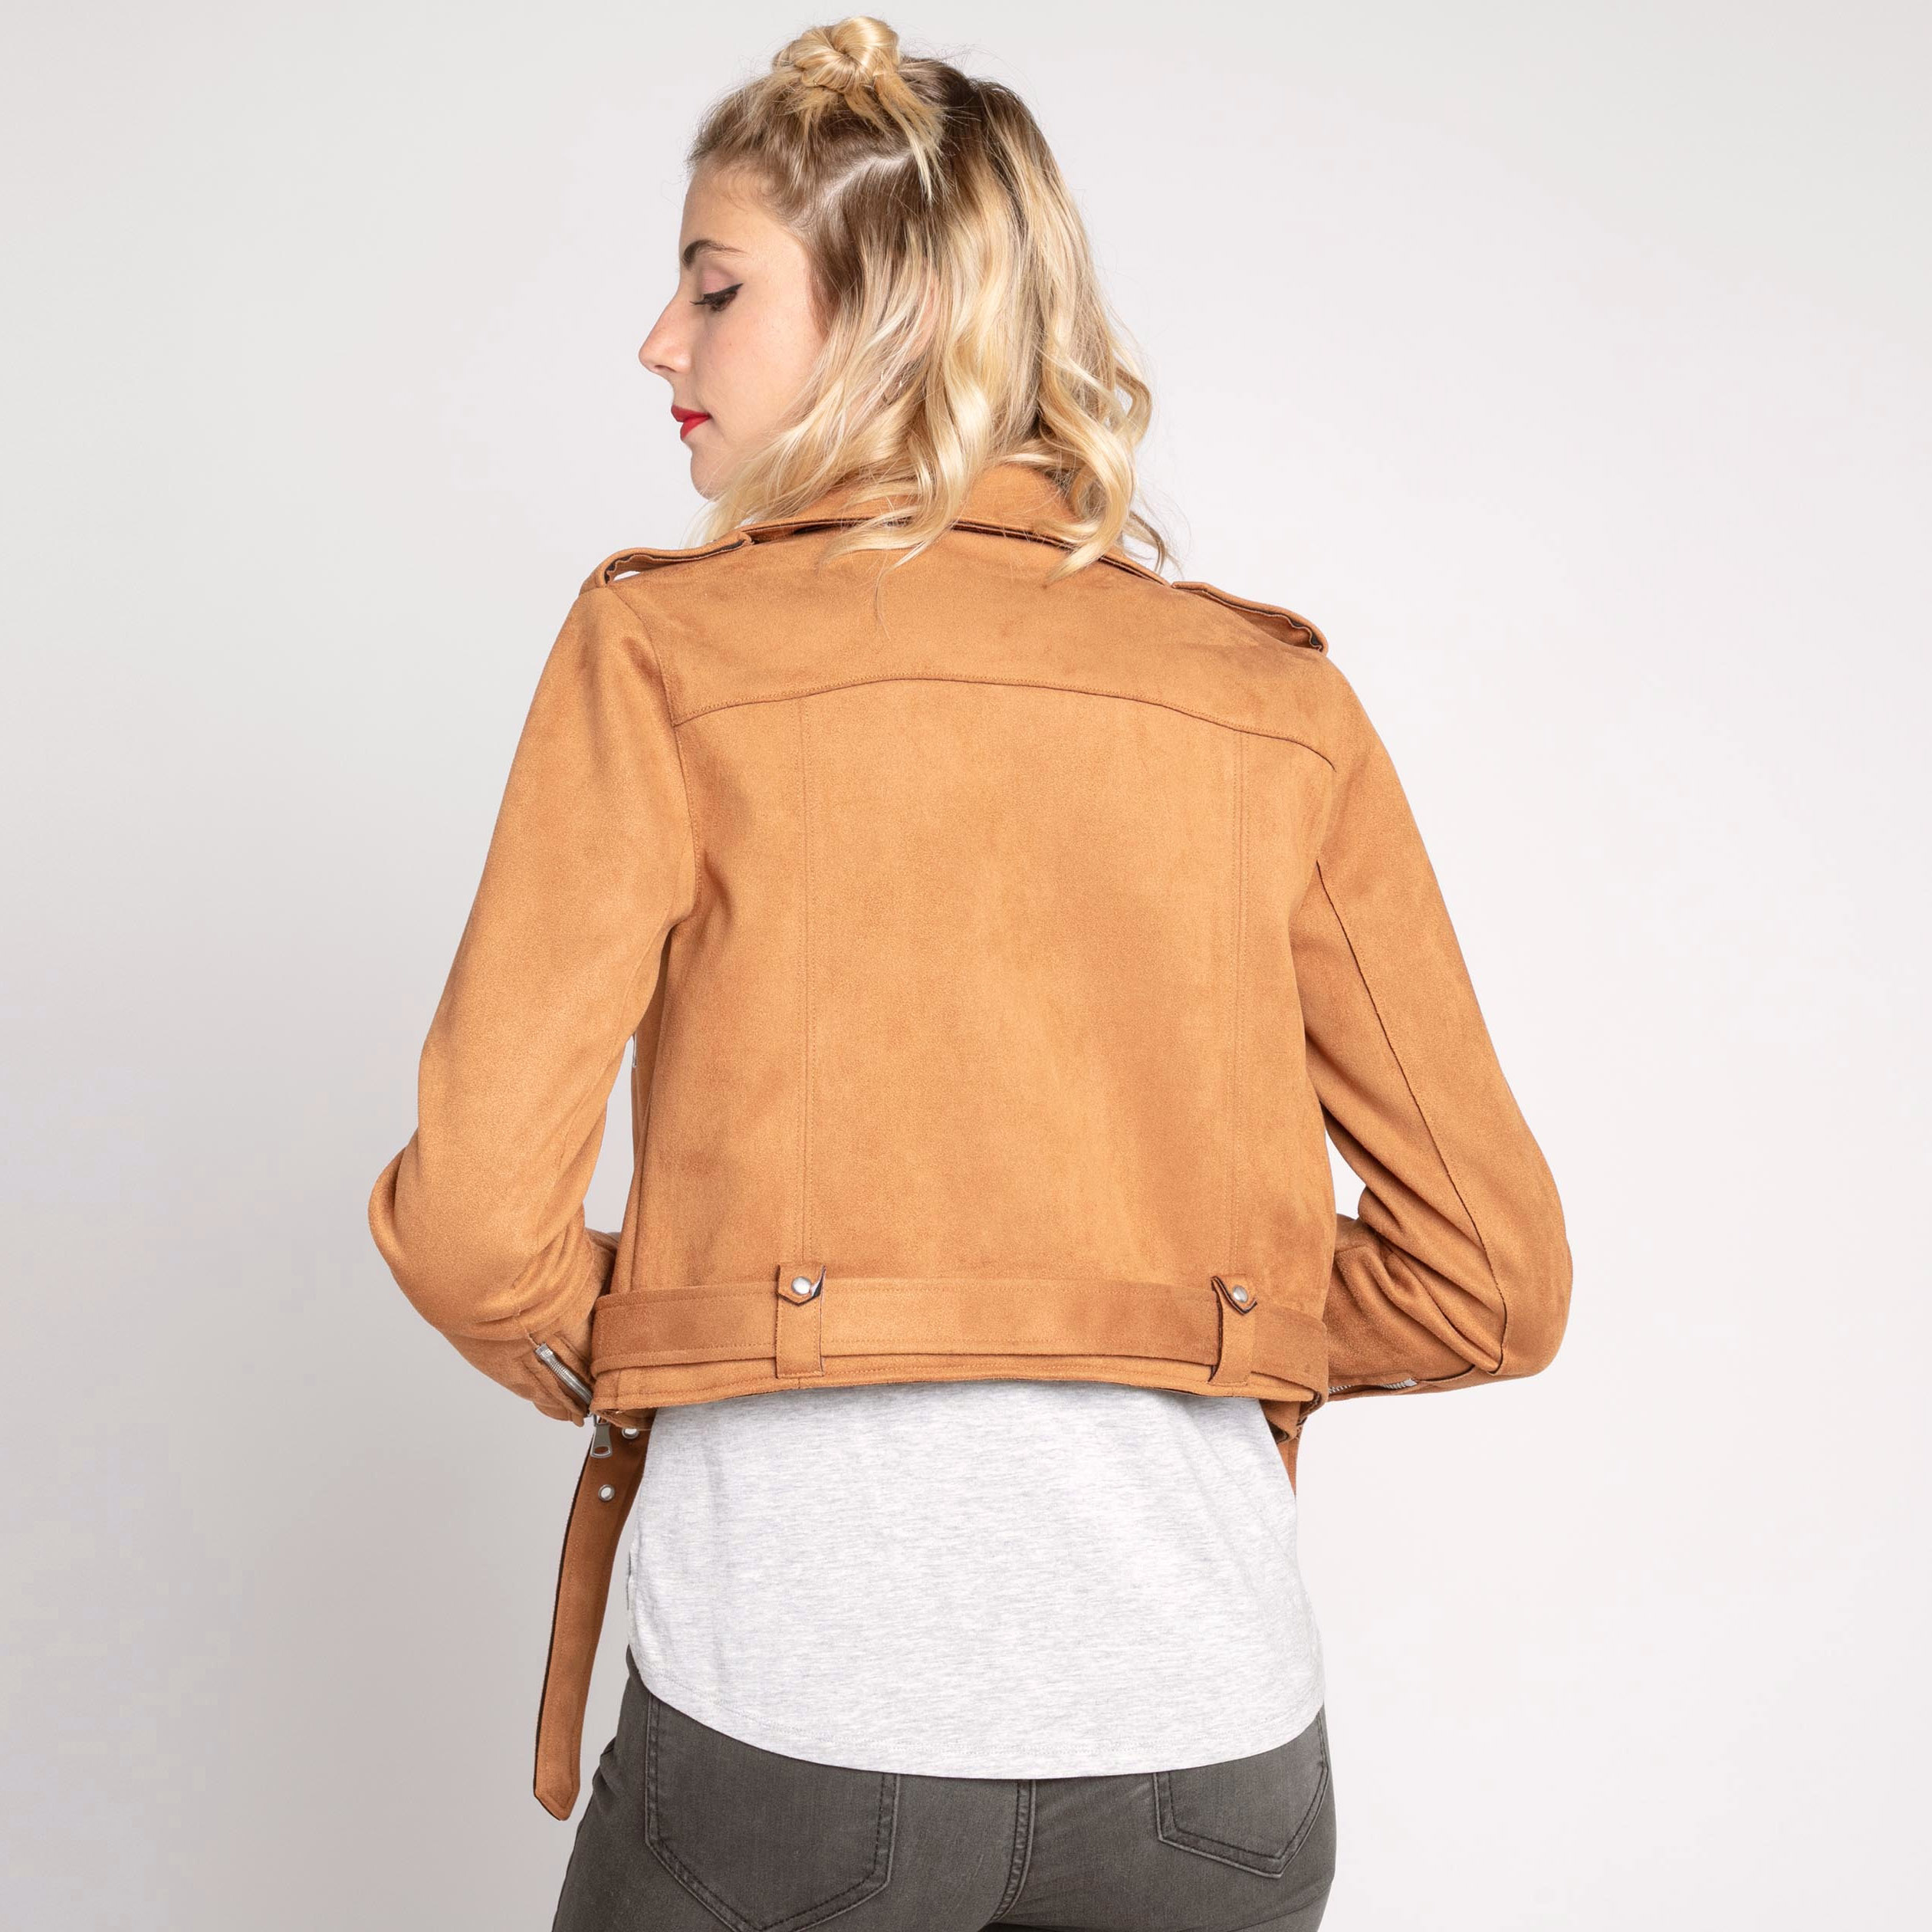 Veste Biker Orange Esprit Suédine Femme Foncé WYEH9ID2